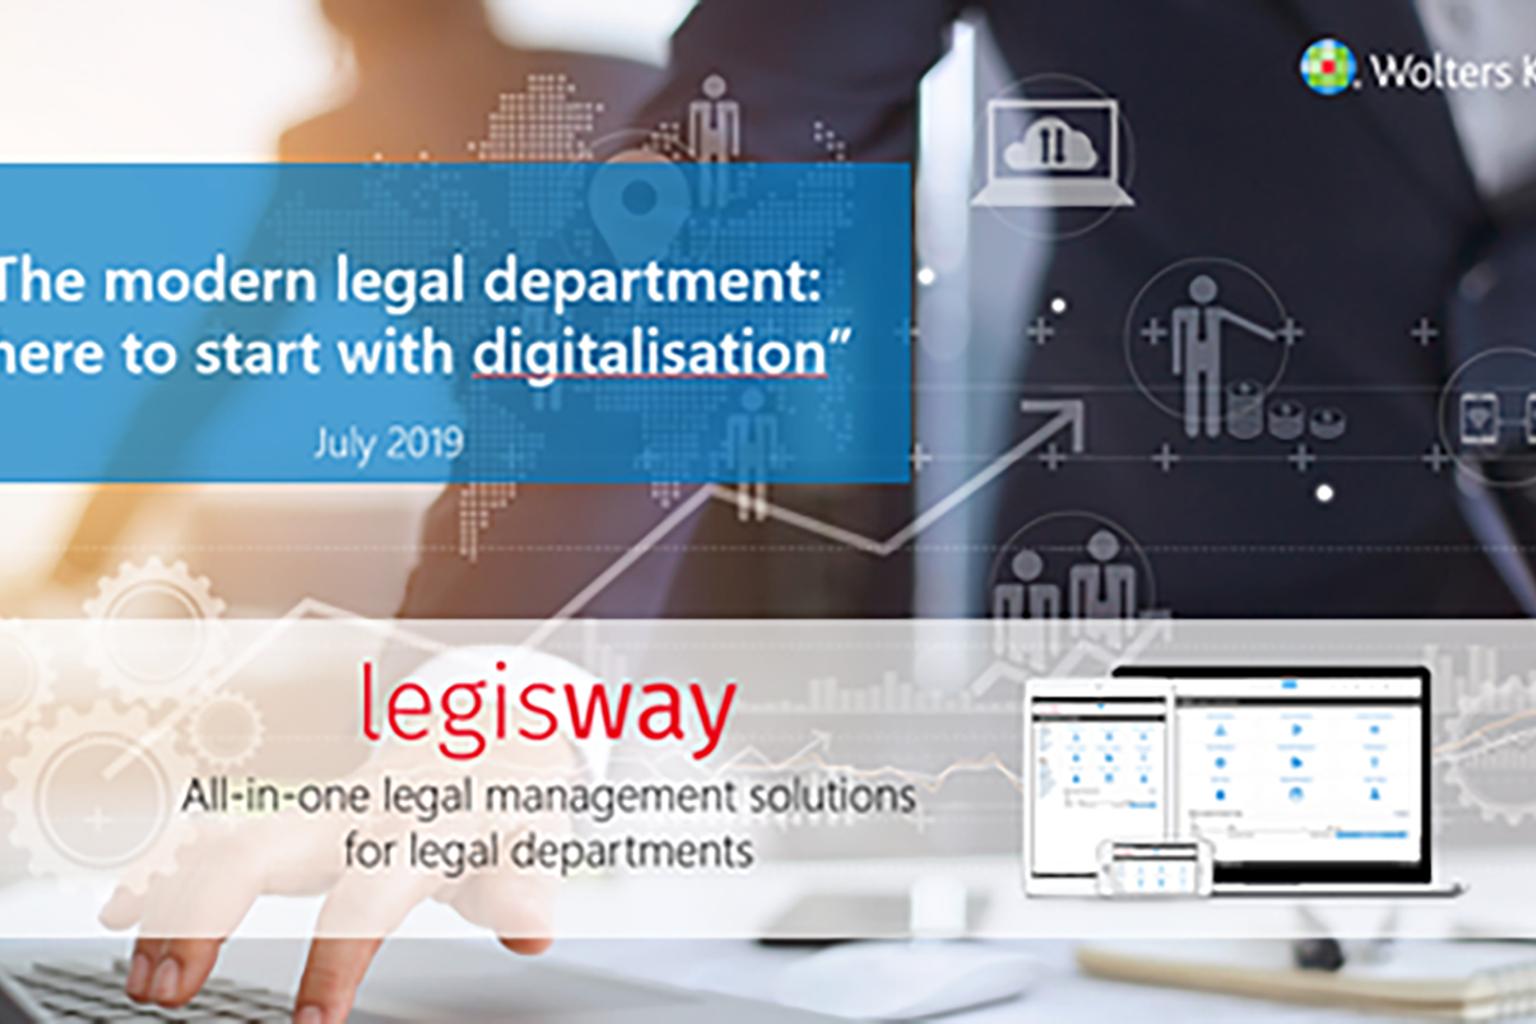 Legisway-digitalisation webinar